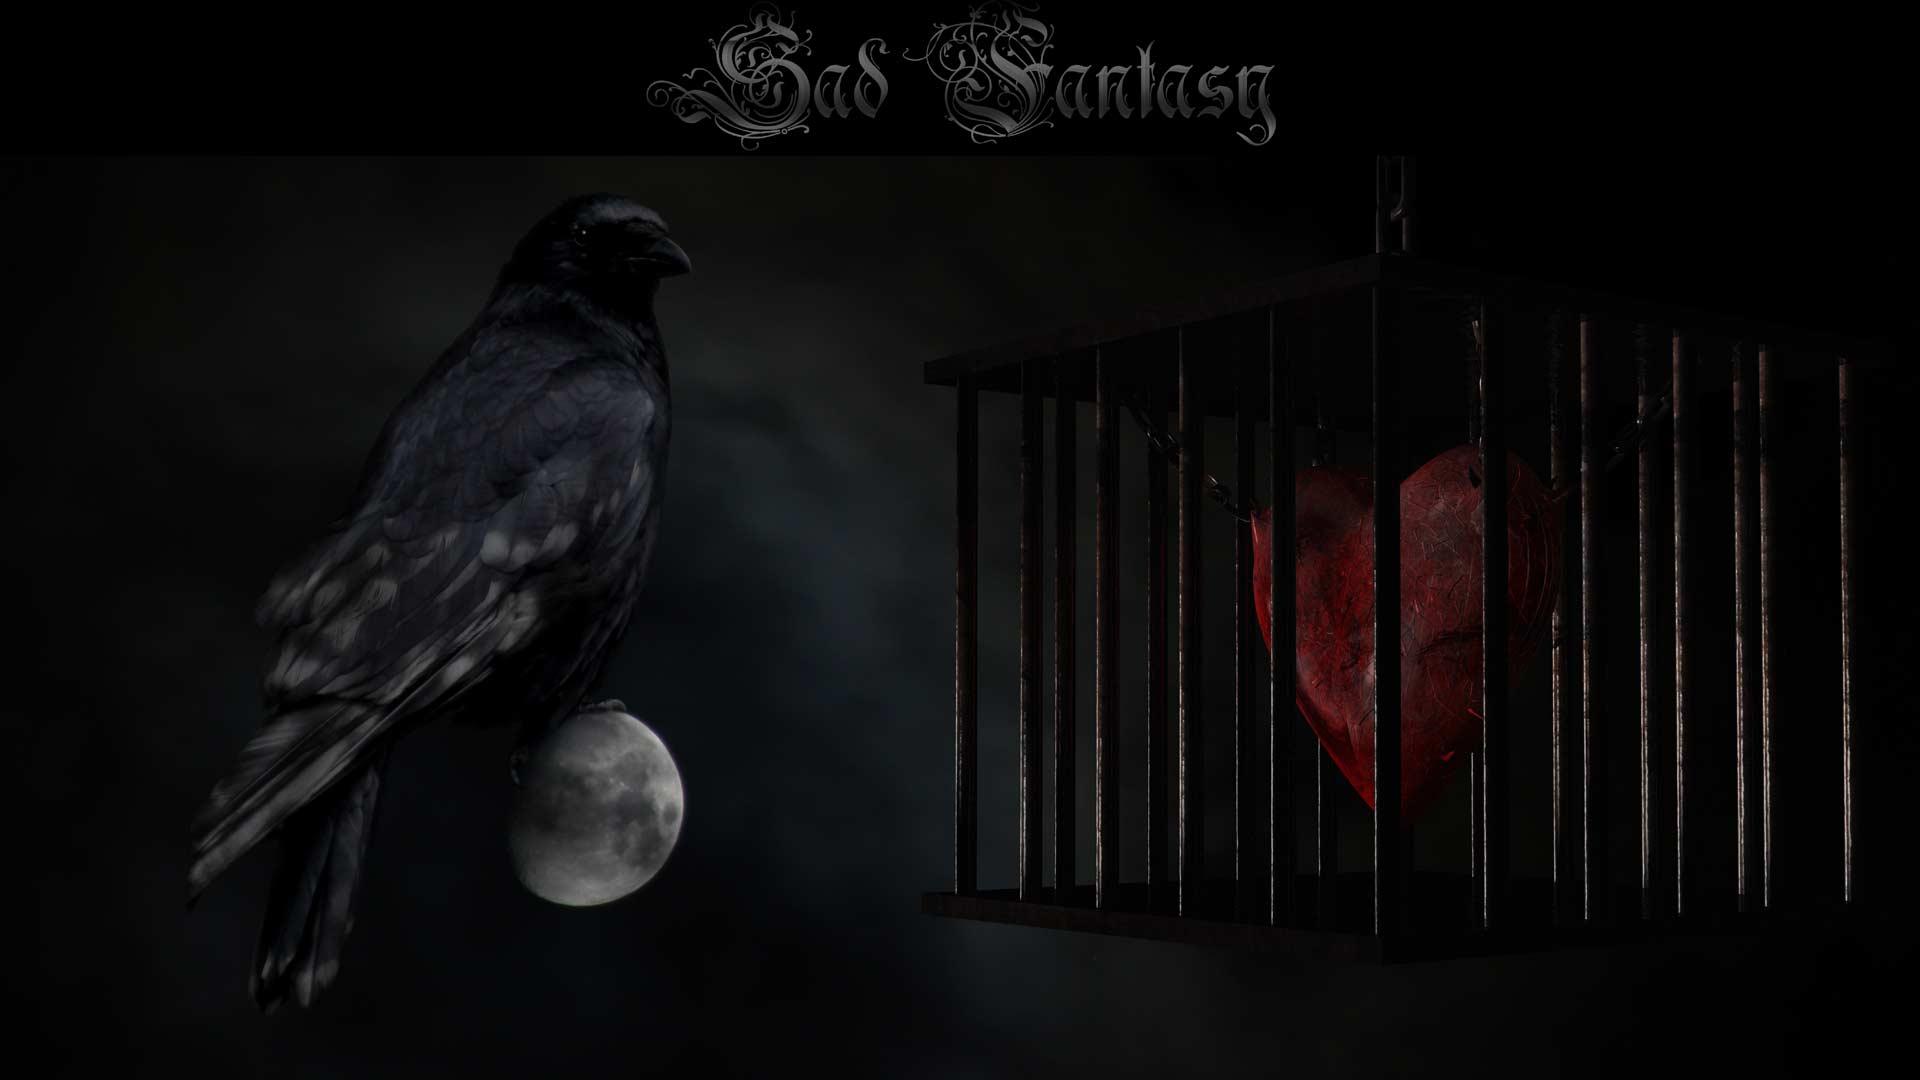 Gothic Crow Wallpaper